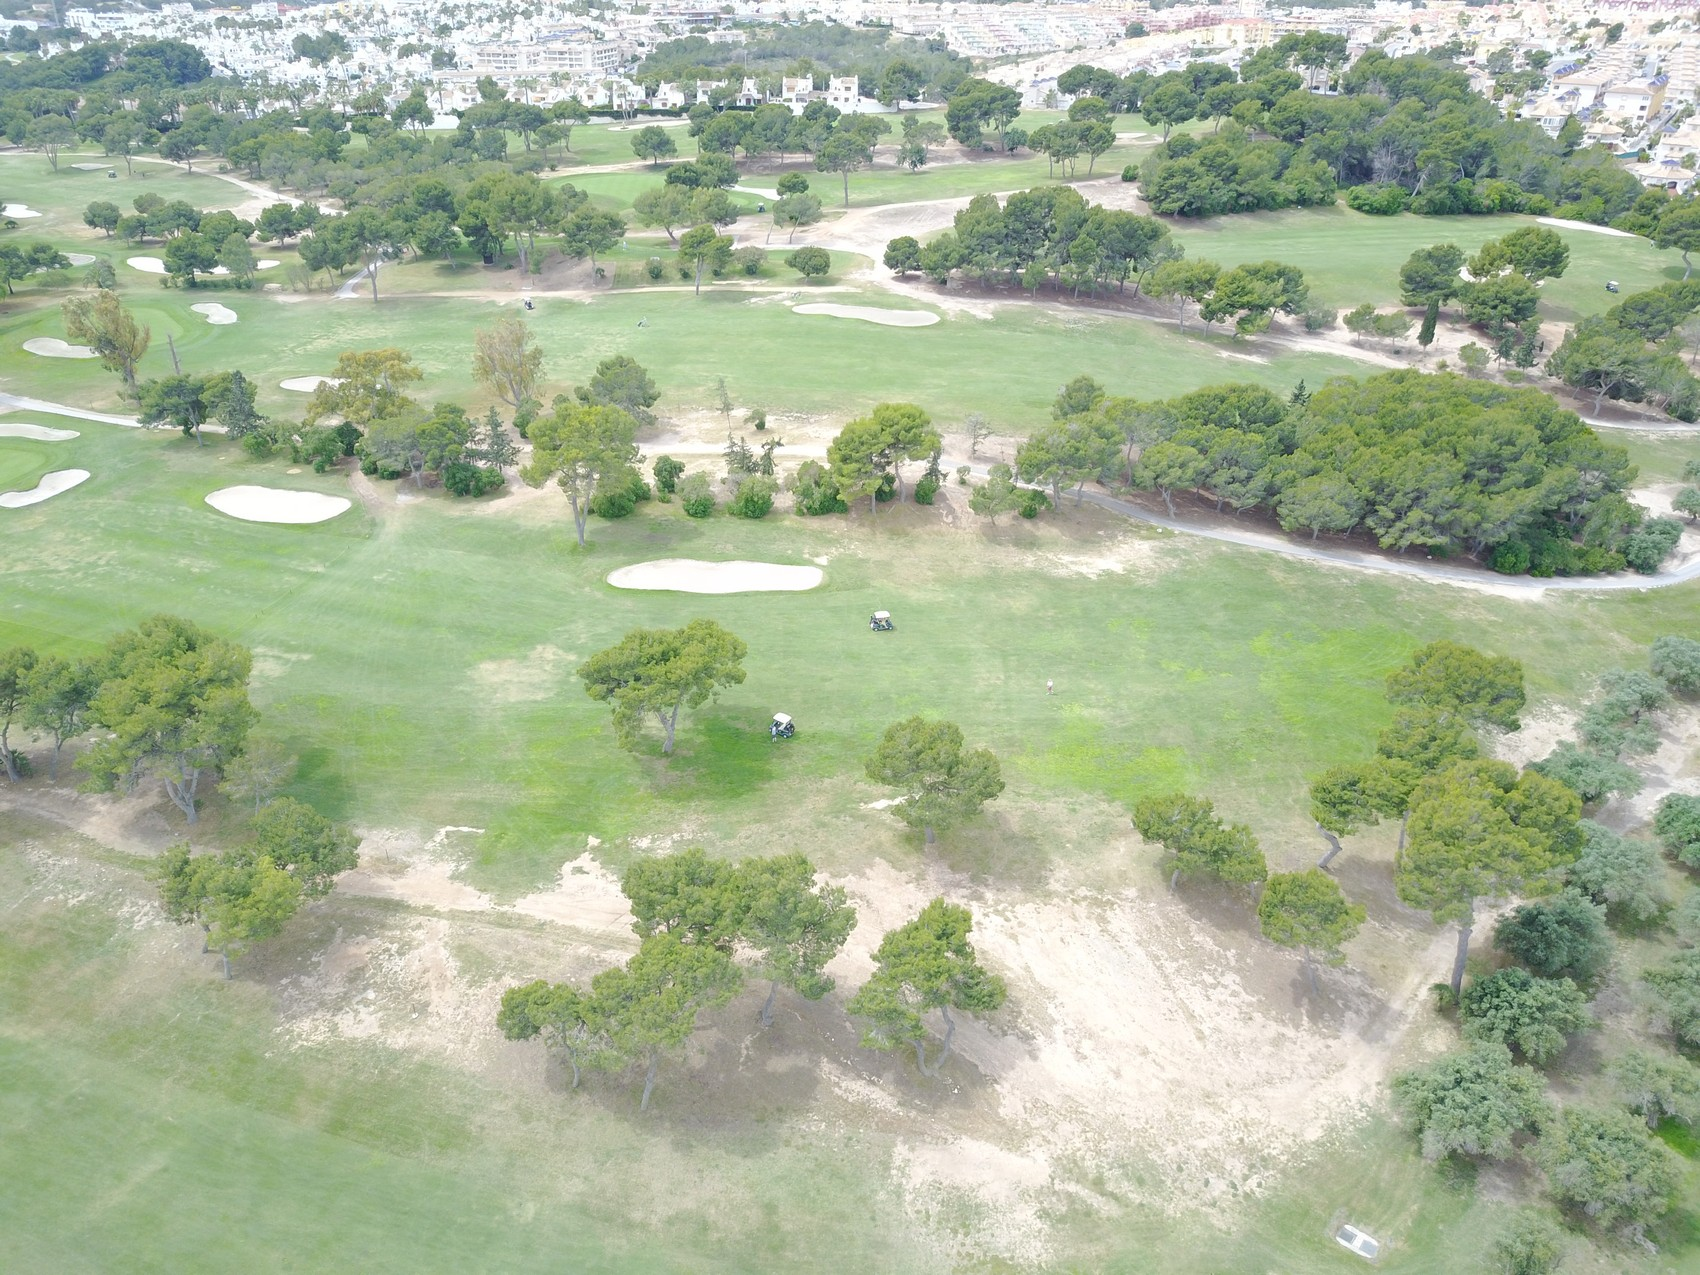 ITSH Property Villamartin Golf Course by drone 10